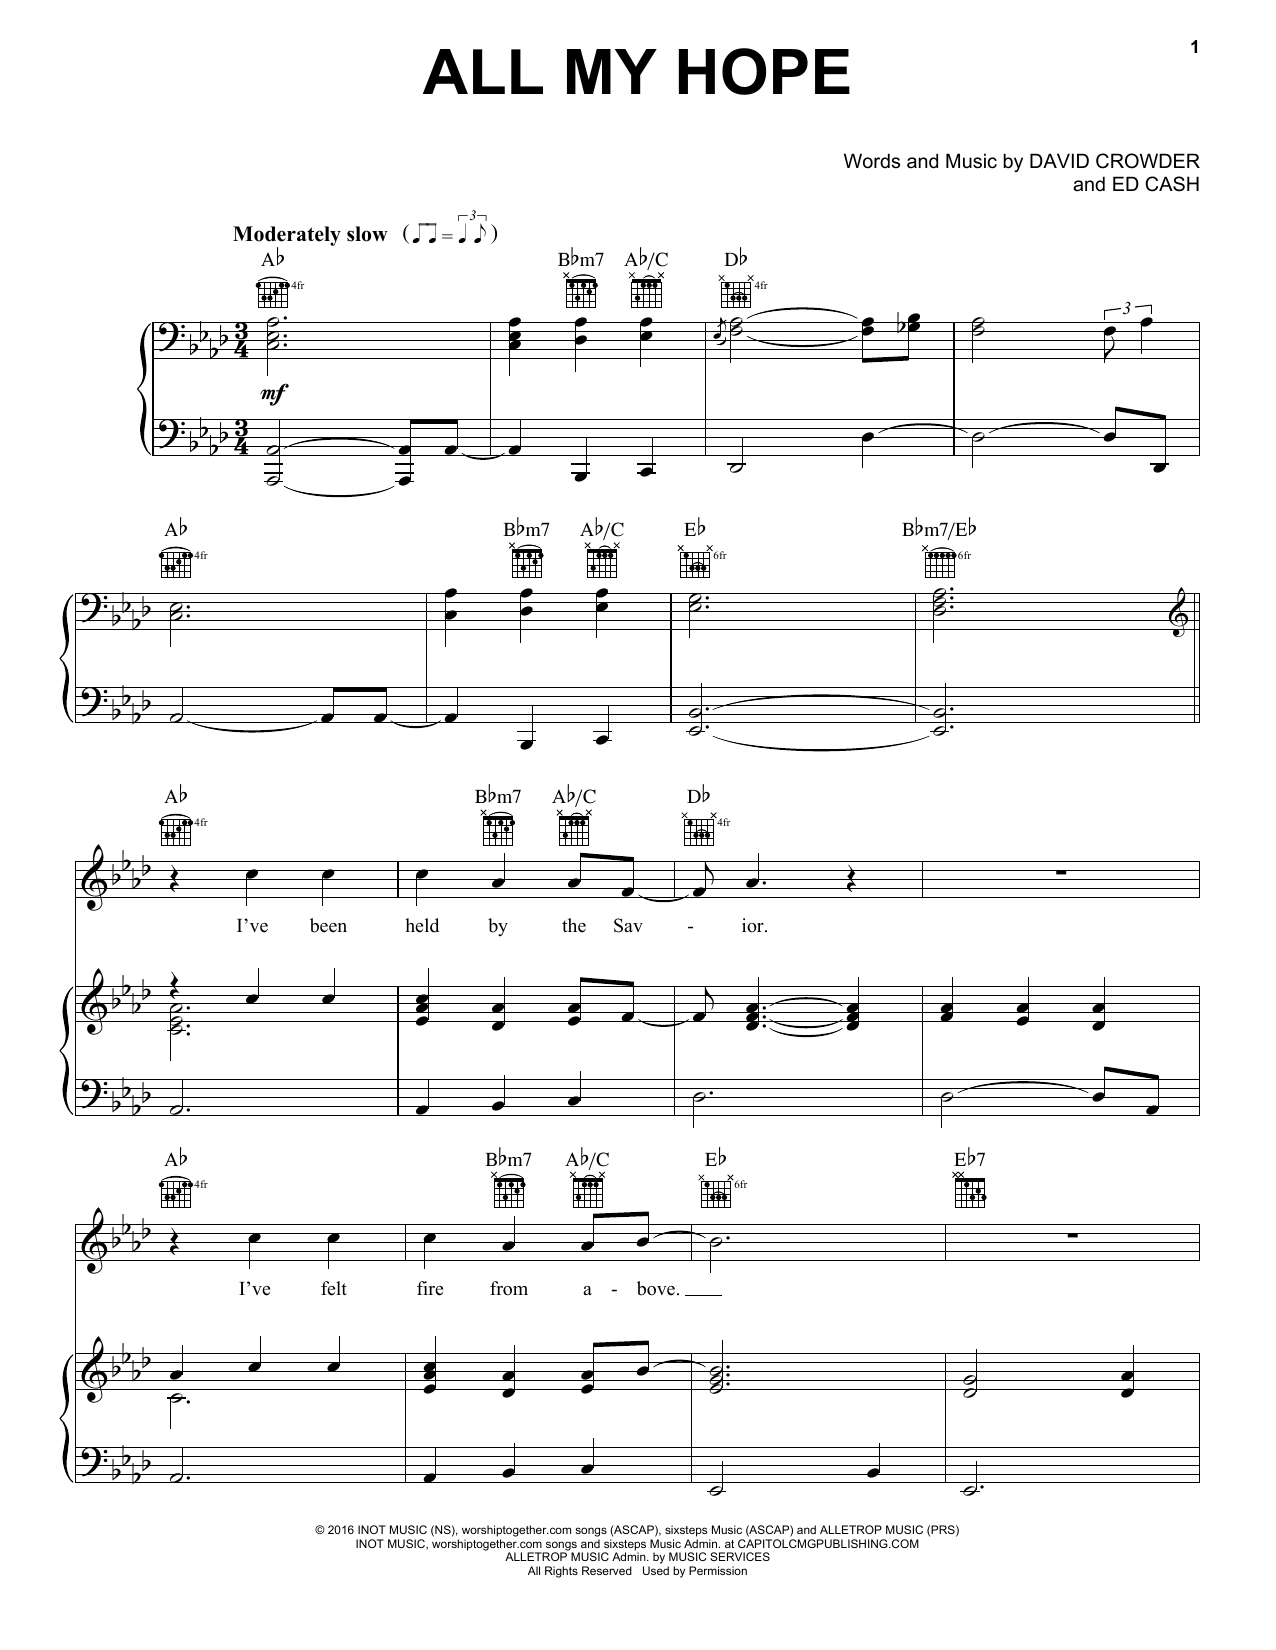 Sheet Music Digital Files To Print Licensed David Crowder Digital